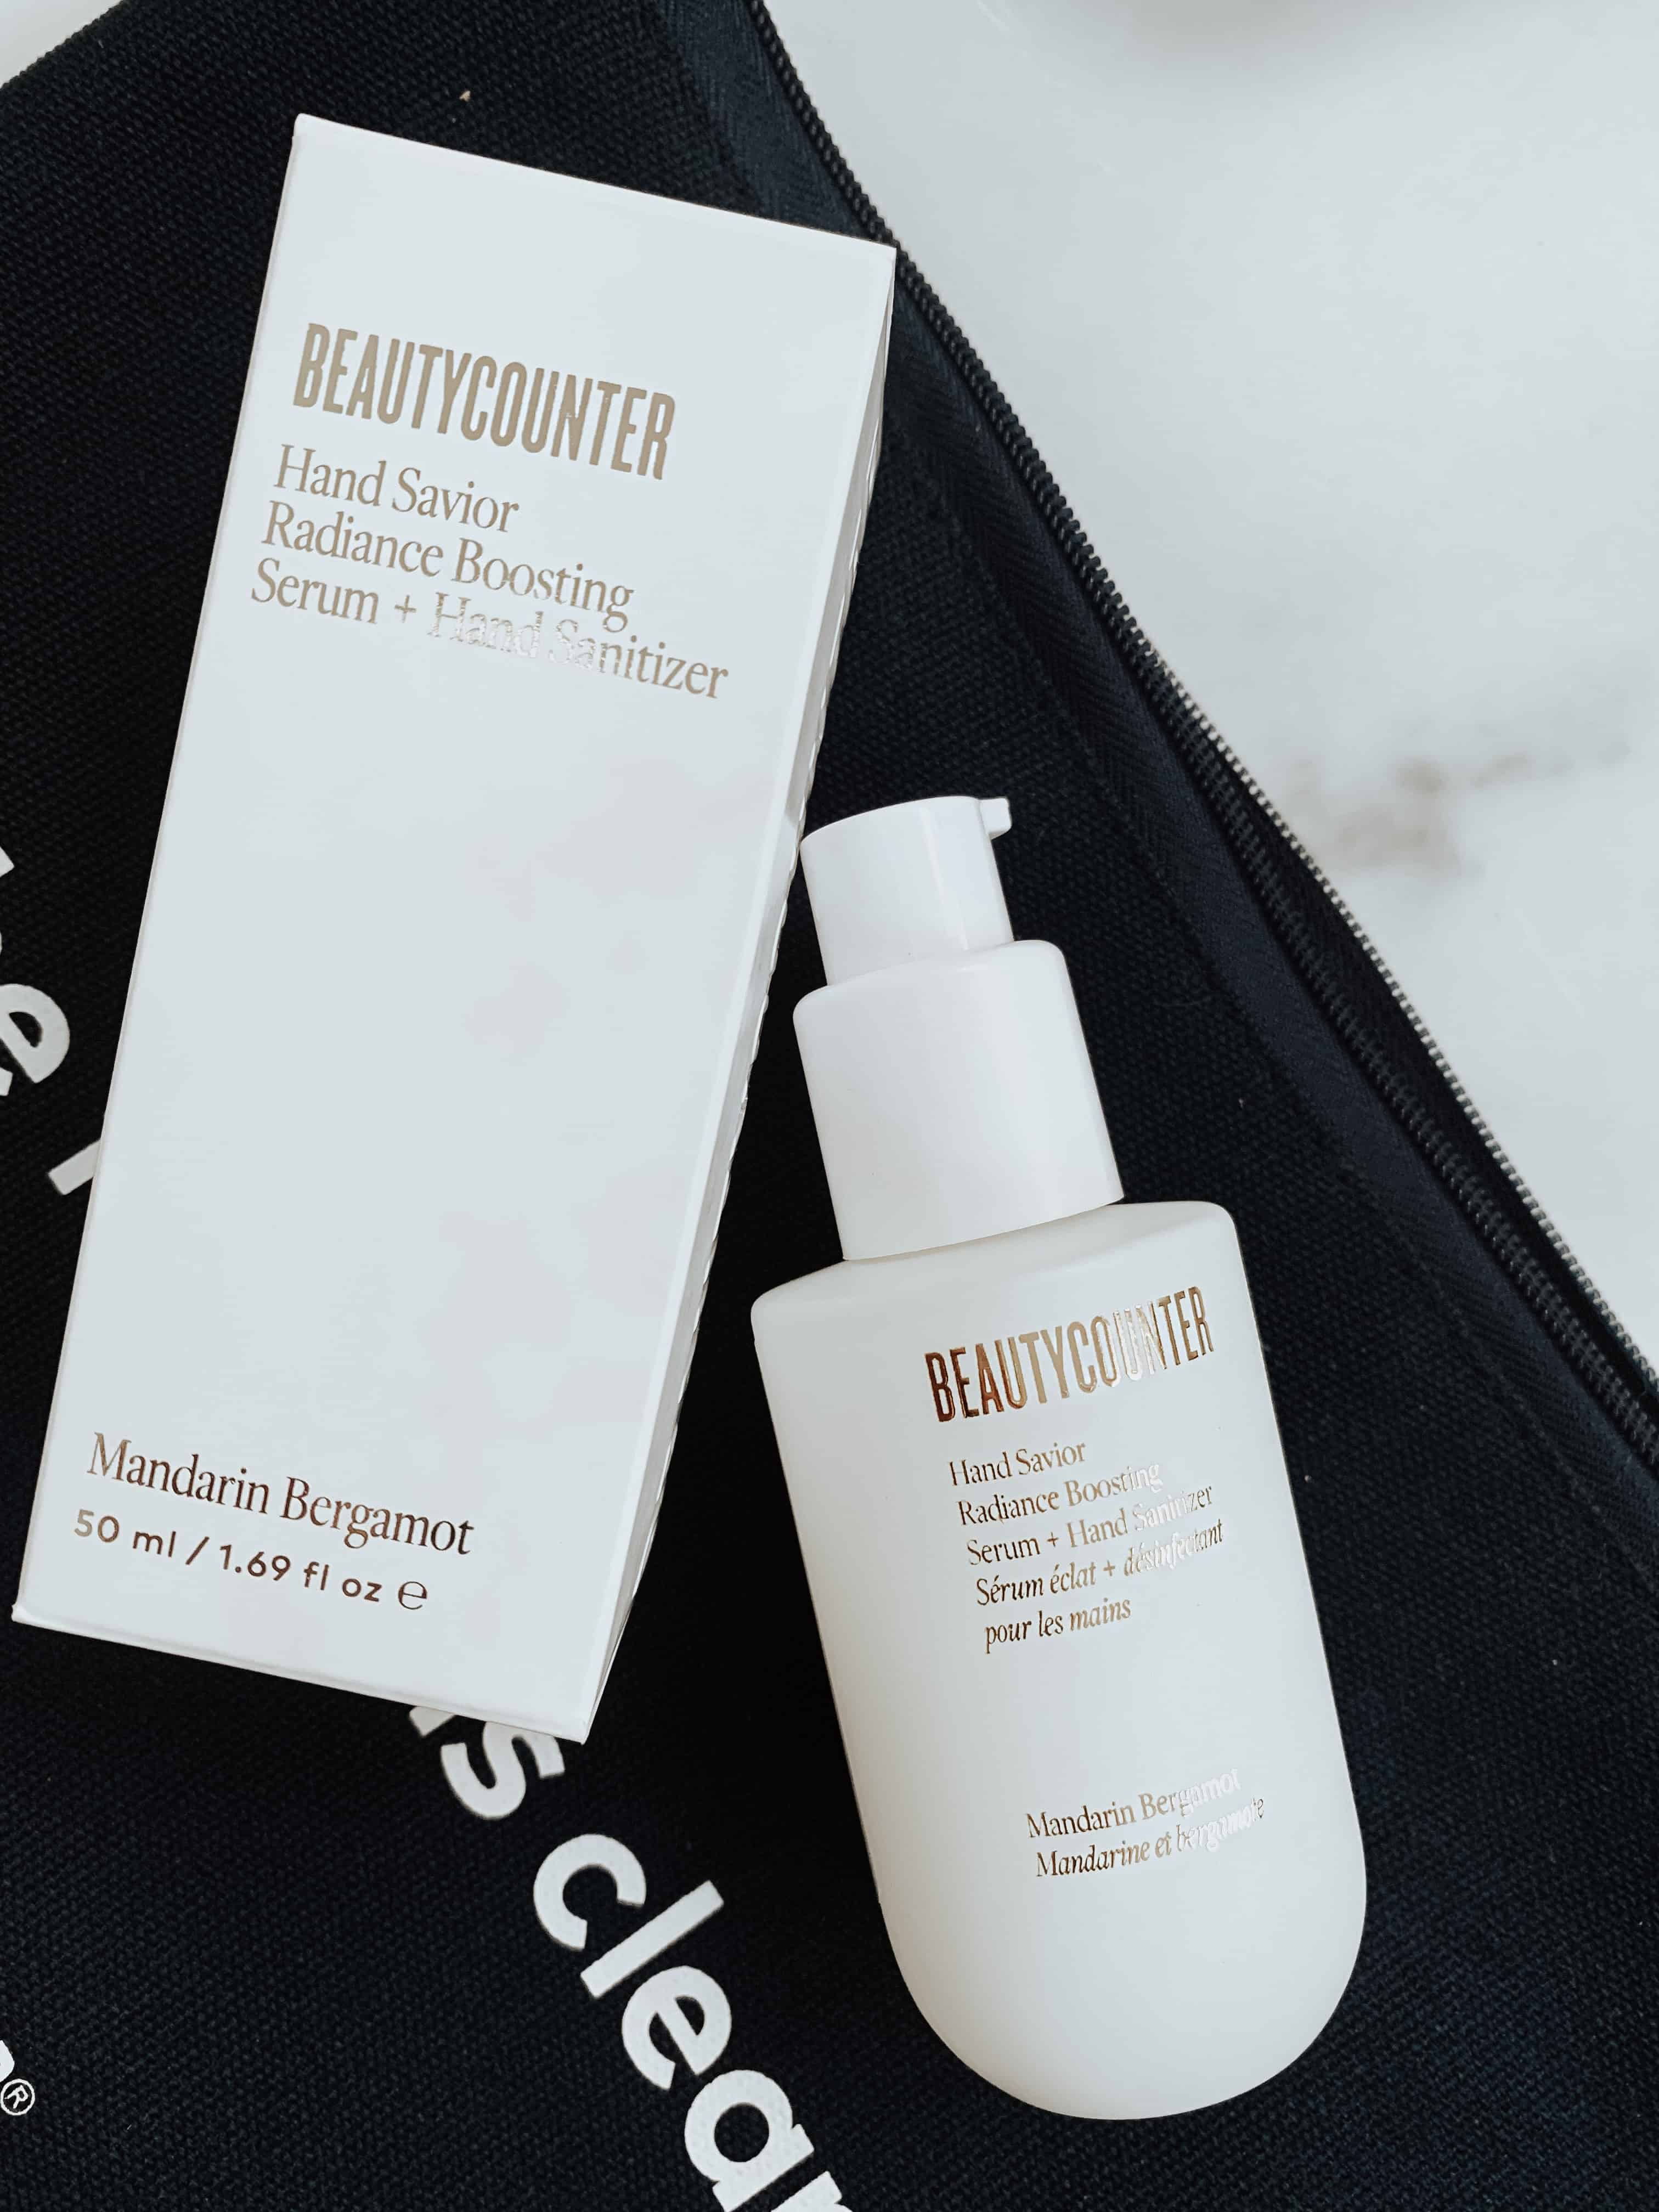 Beautycounter's new Hand Savior Radiance Serum + Hand Sanitizer product and packaging.